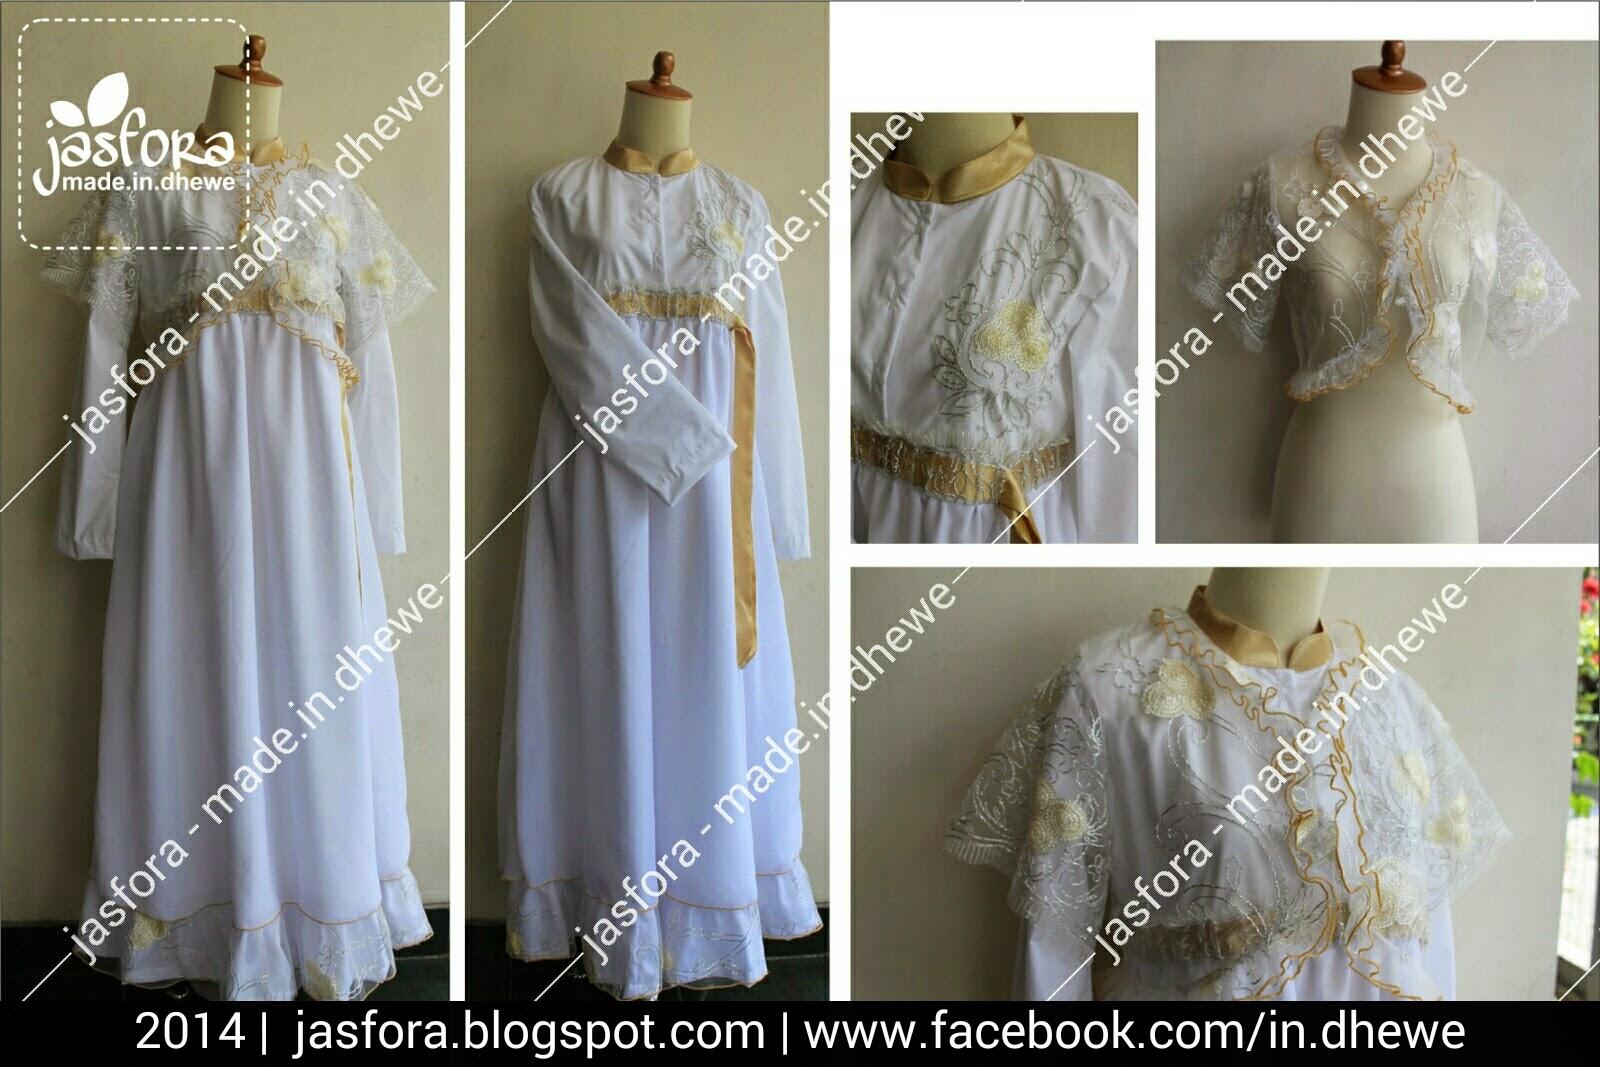 gaun pengantin muslimah katun poplin putih bersih kombinasi sifon ceruti putih bersih dengan bolero dari tile motif warna dasar putih tulang, dan list pinggir dengan pita emas